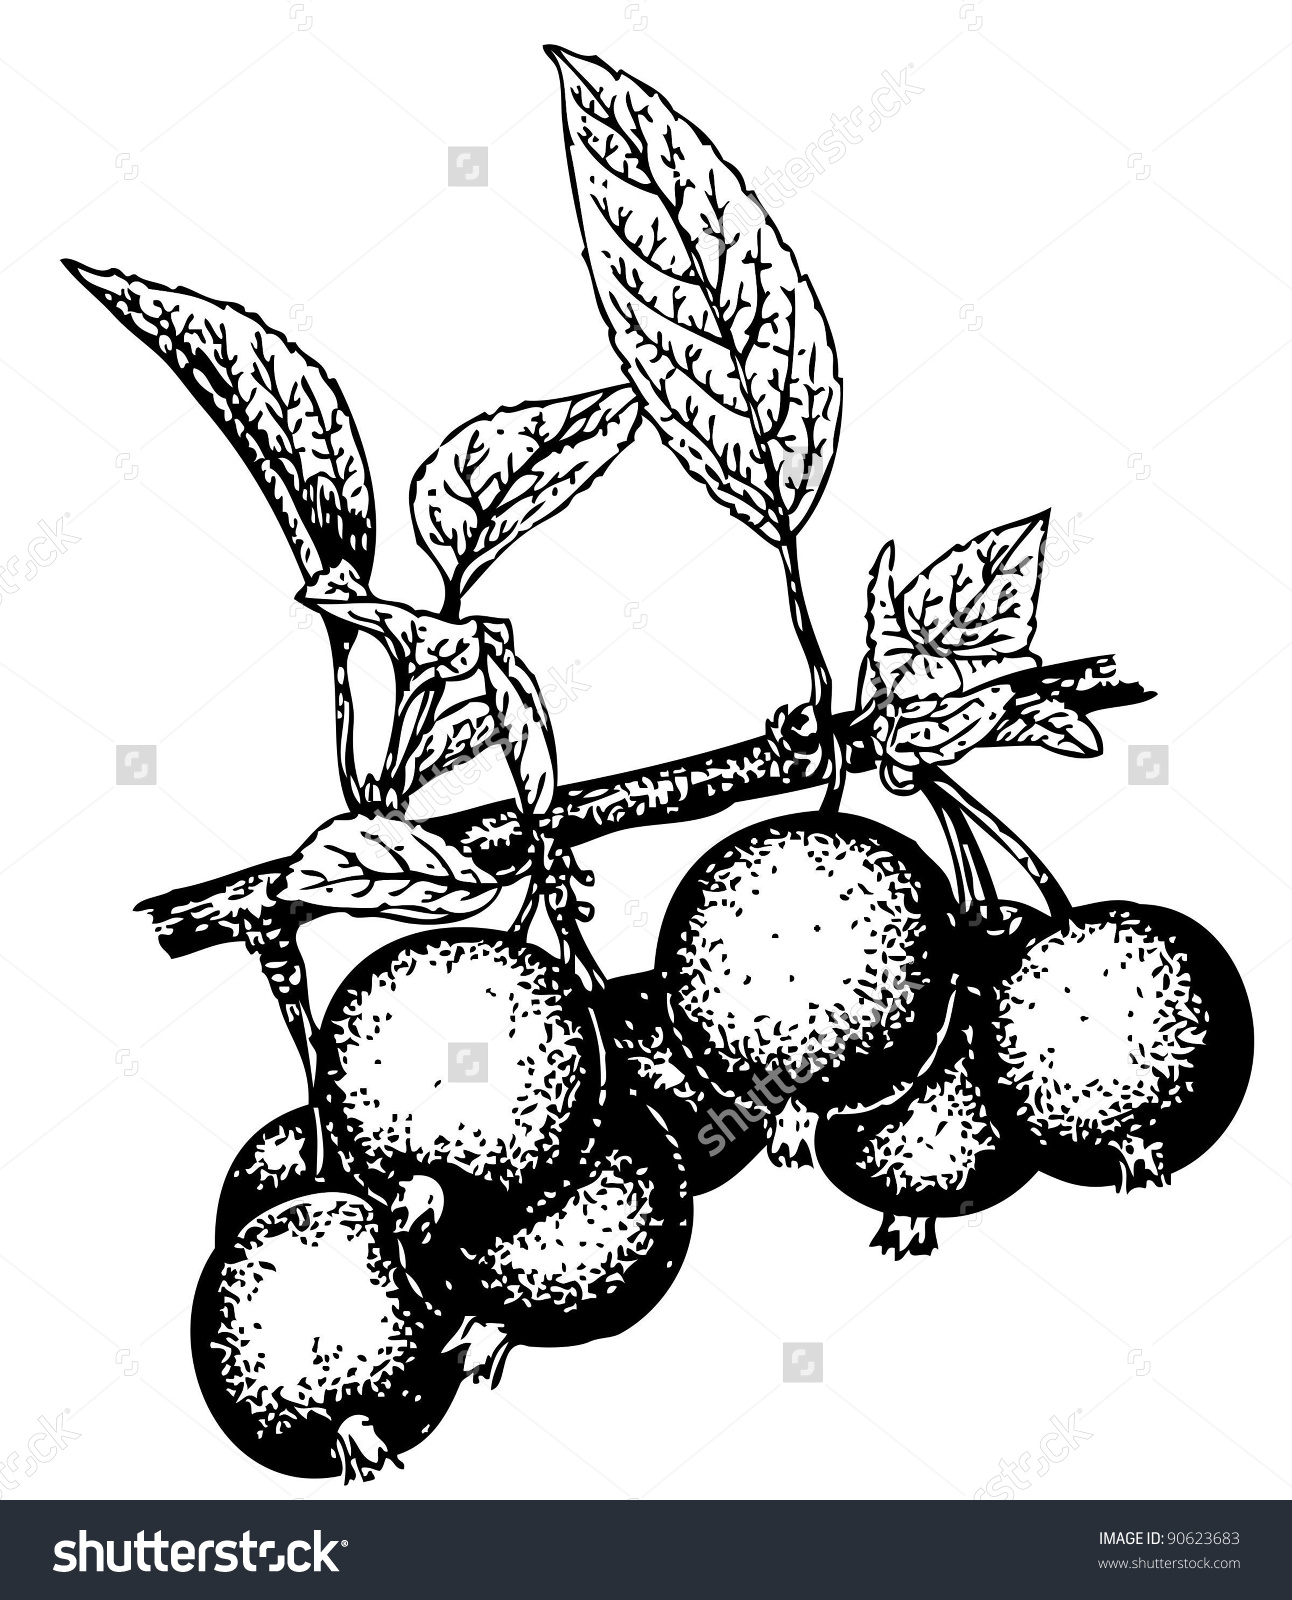 Plant Malus Prunifolia (Pear.